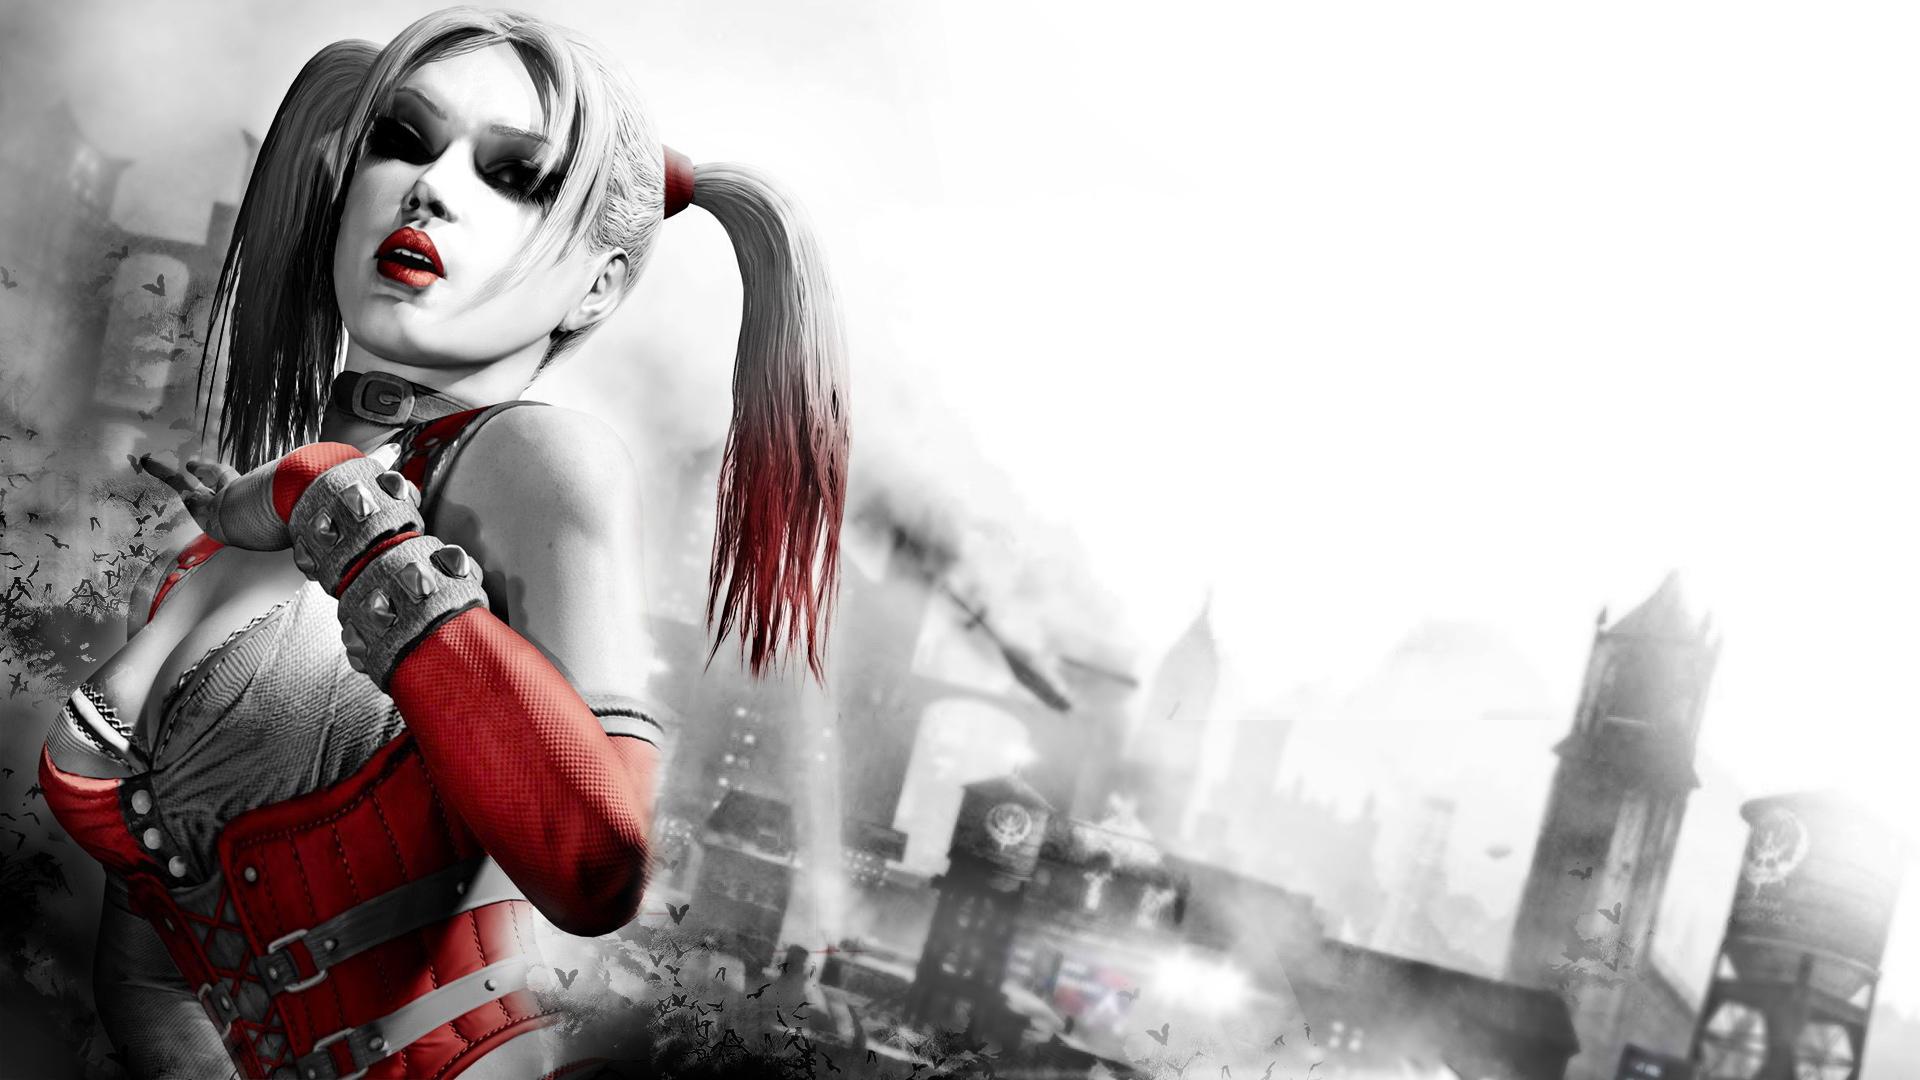 Batman Arkham City Harley Quinn wallpaper   876176 1920x1080